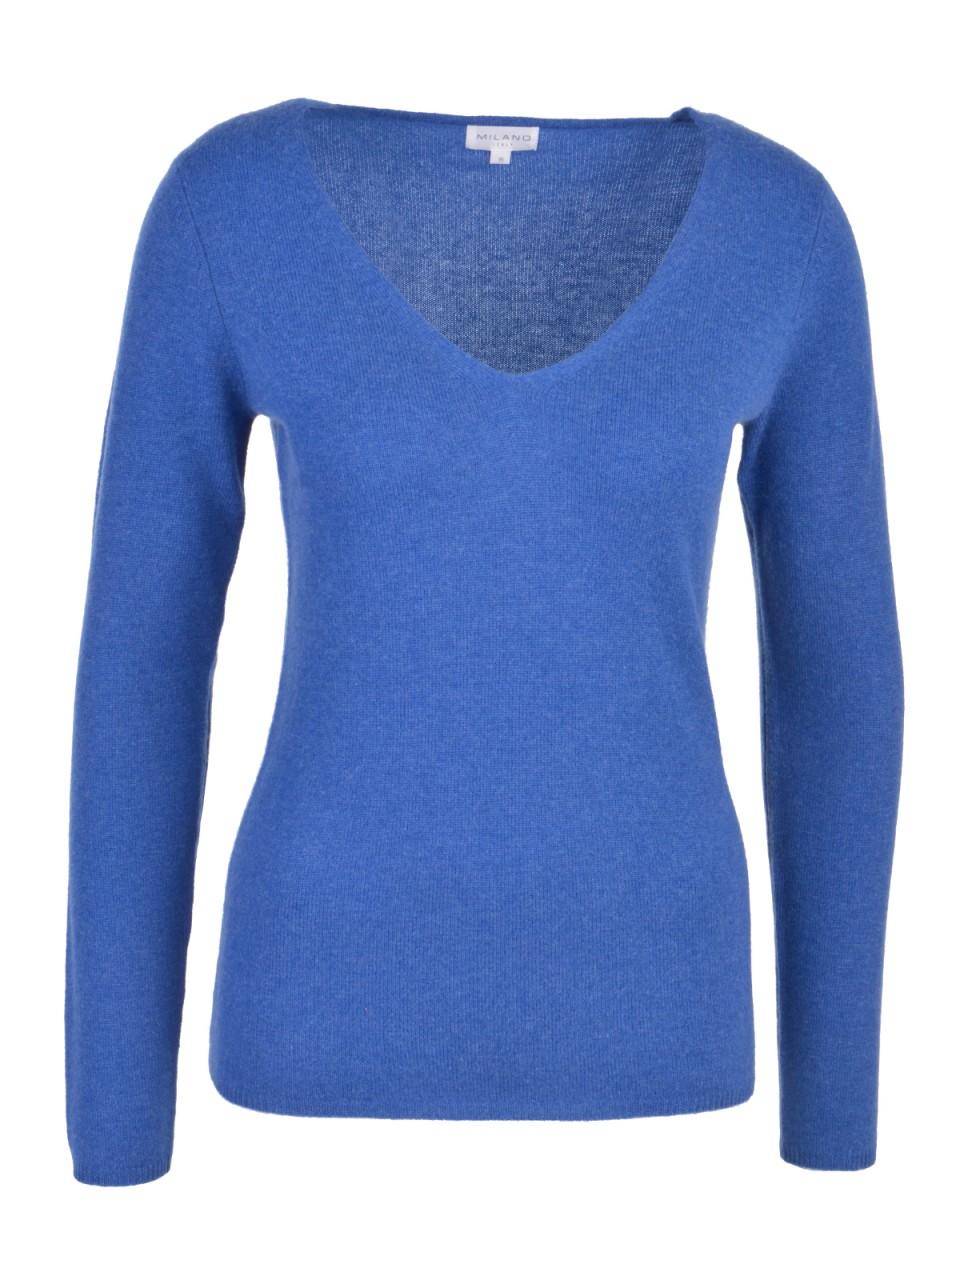 milano-italy-damen-kaschmir-pullover-mittelblau